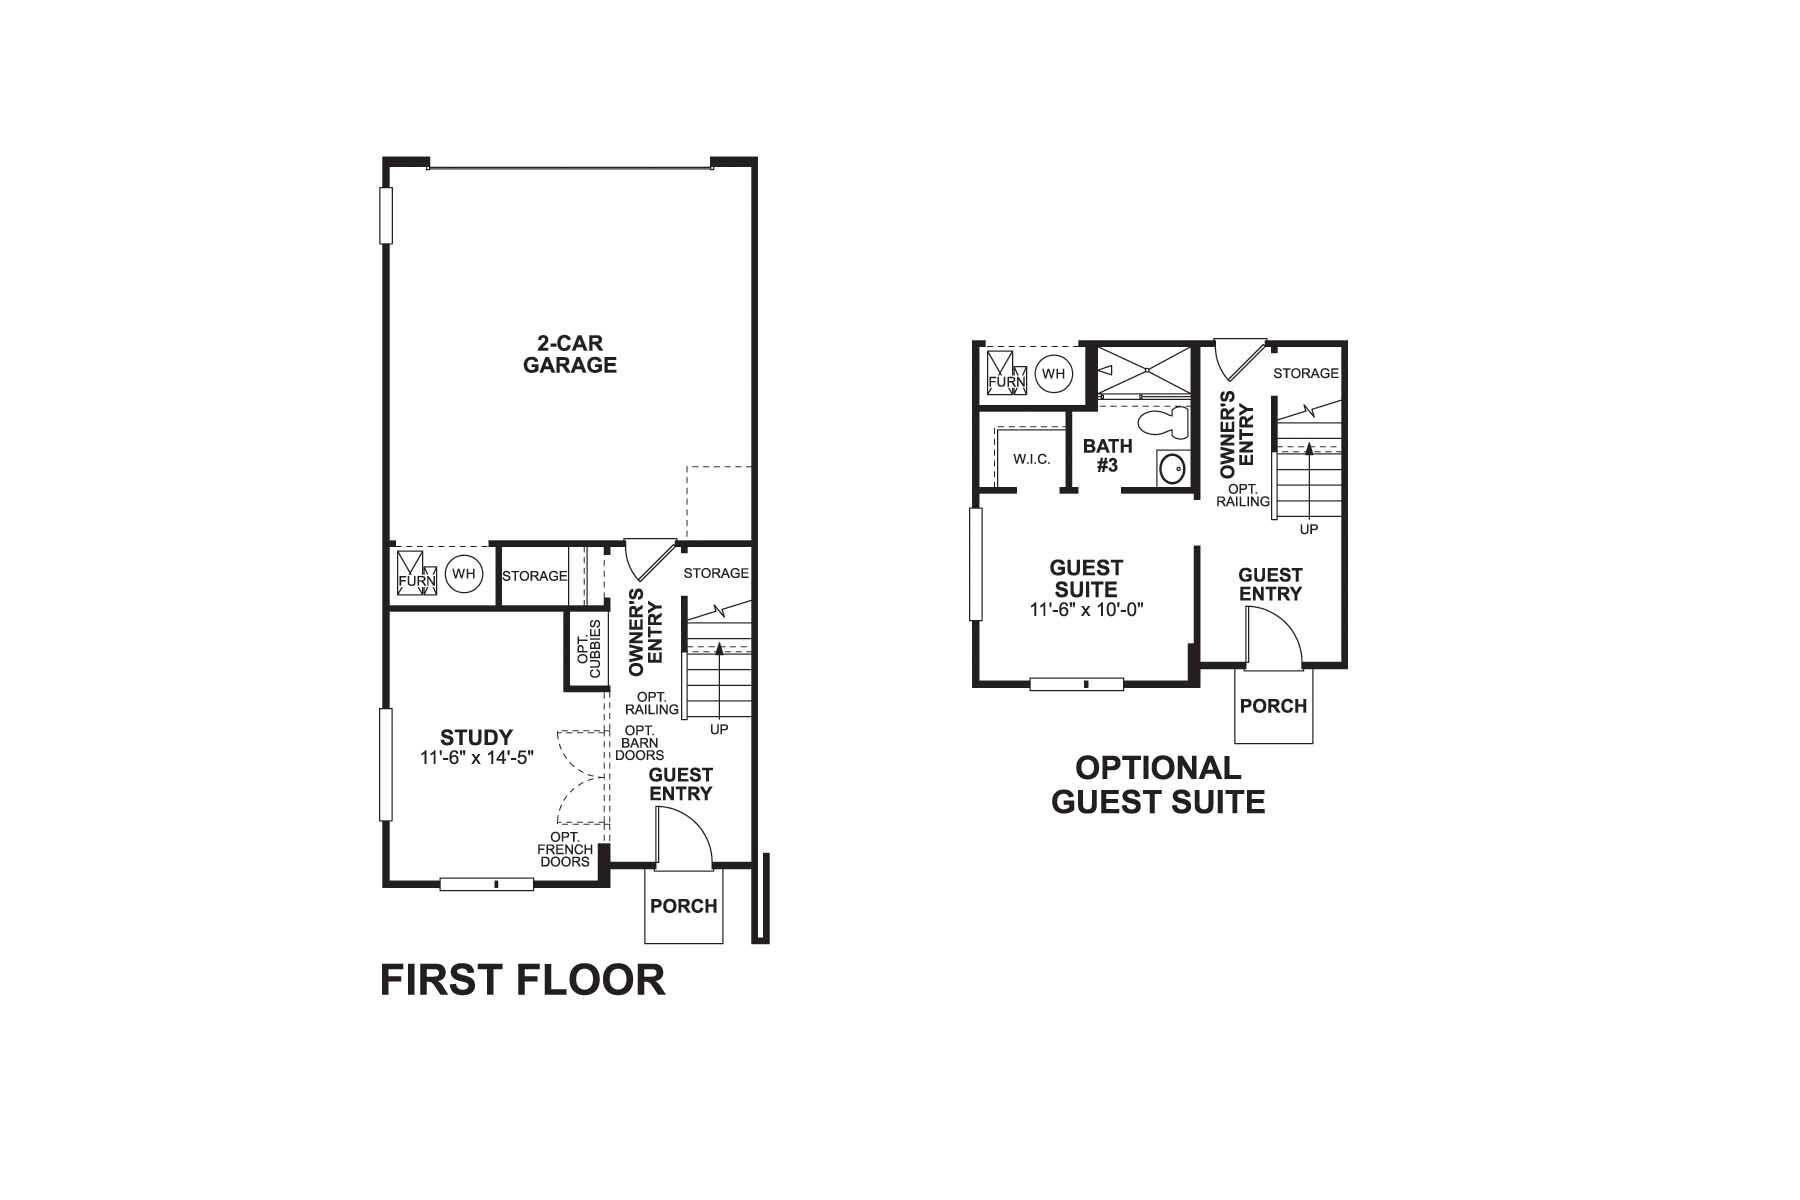 T1800 First Floor